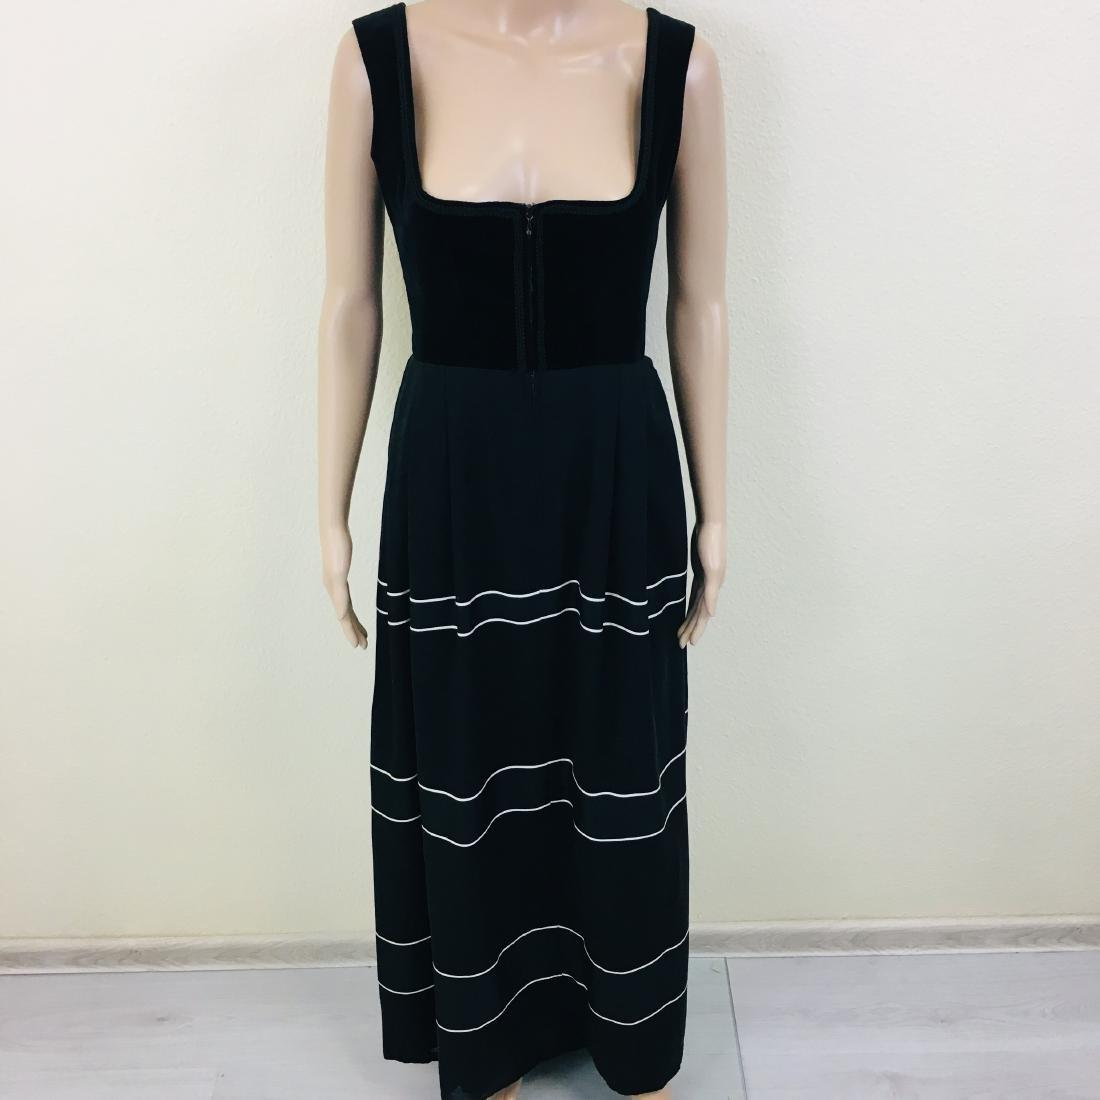 Vintage Women's Black Tyrolean Drindl Dress - 3